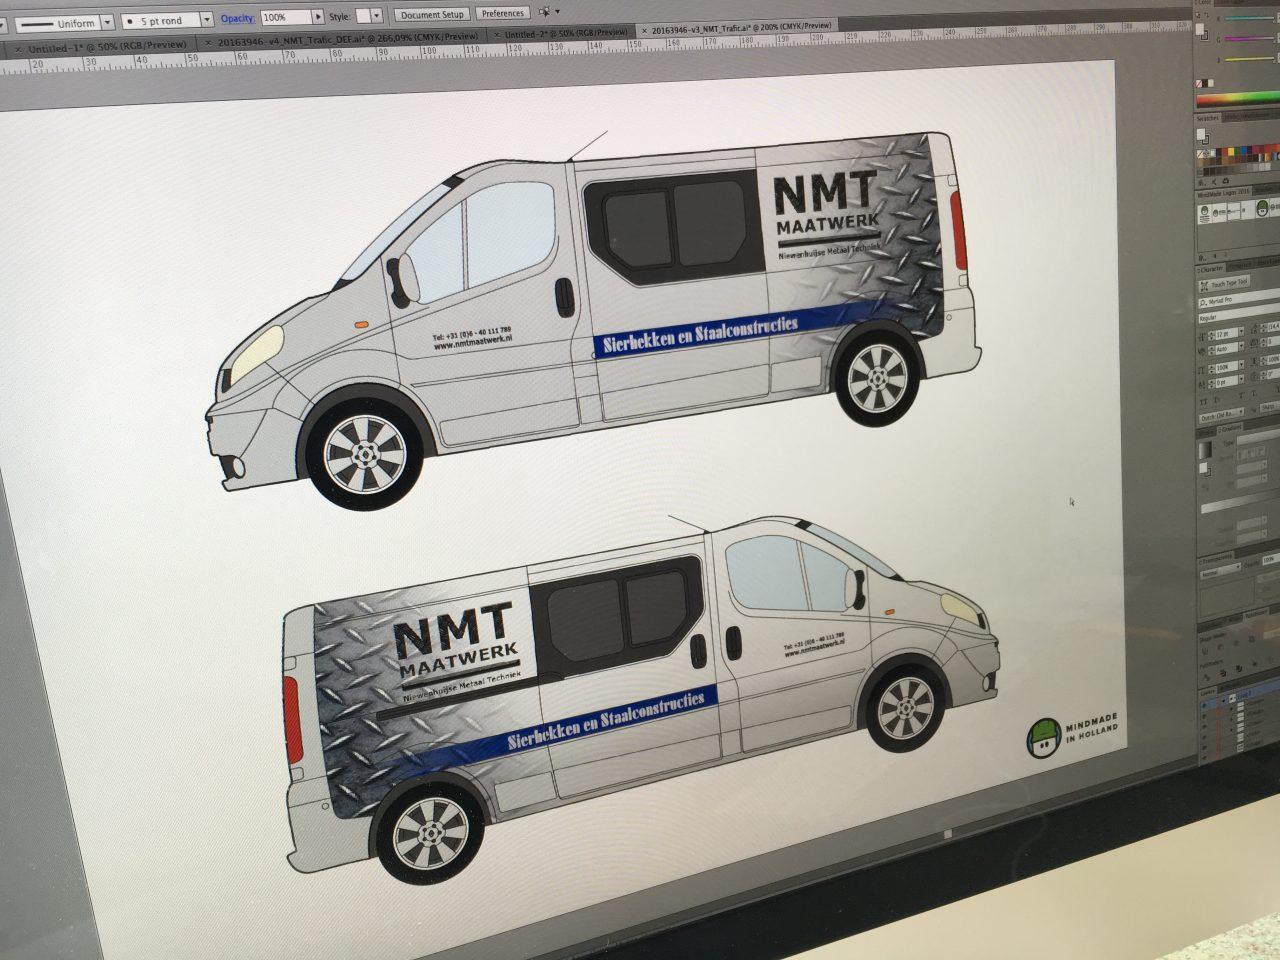 NMT Maatwerk - Ontwerp